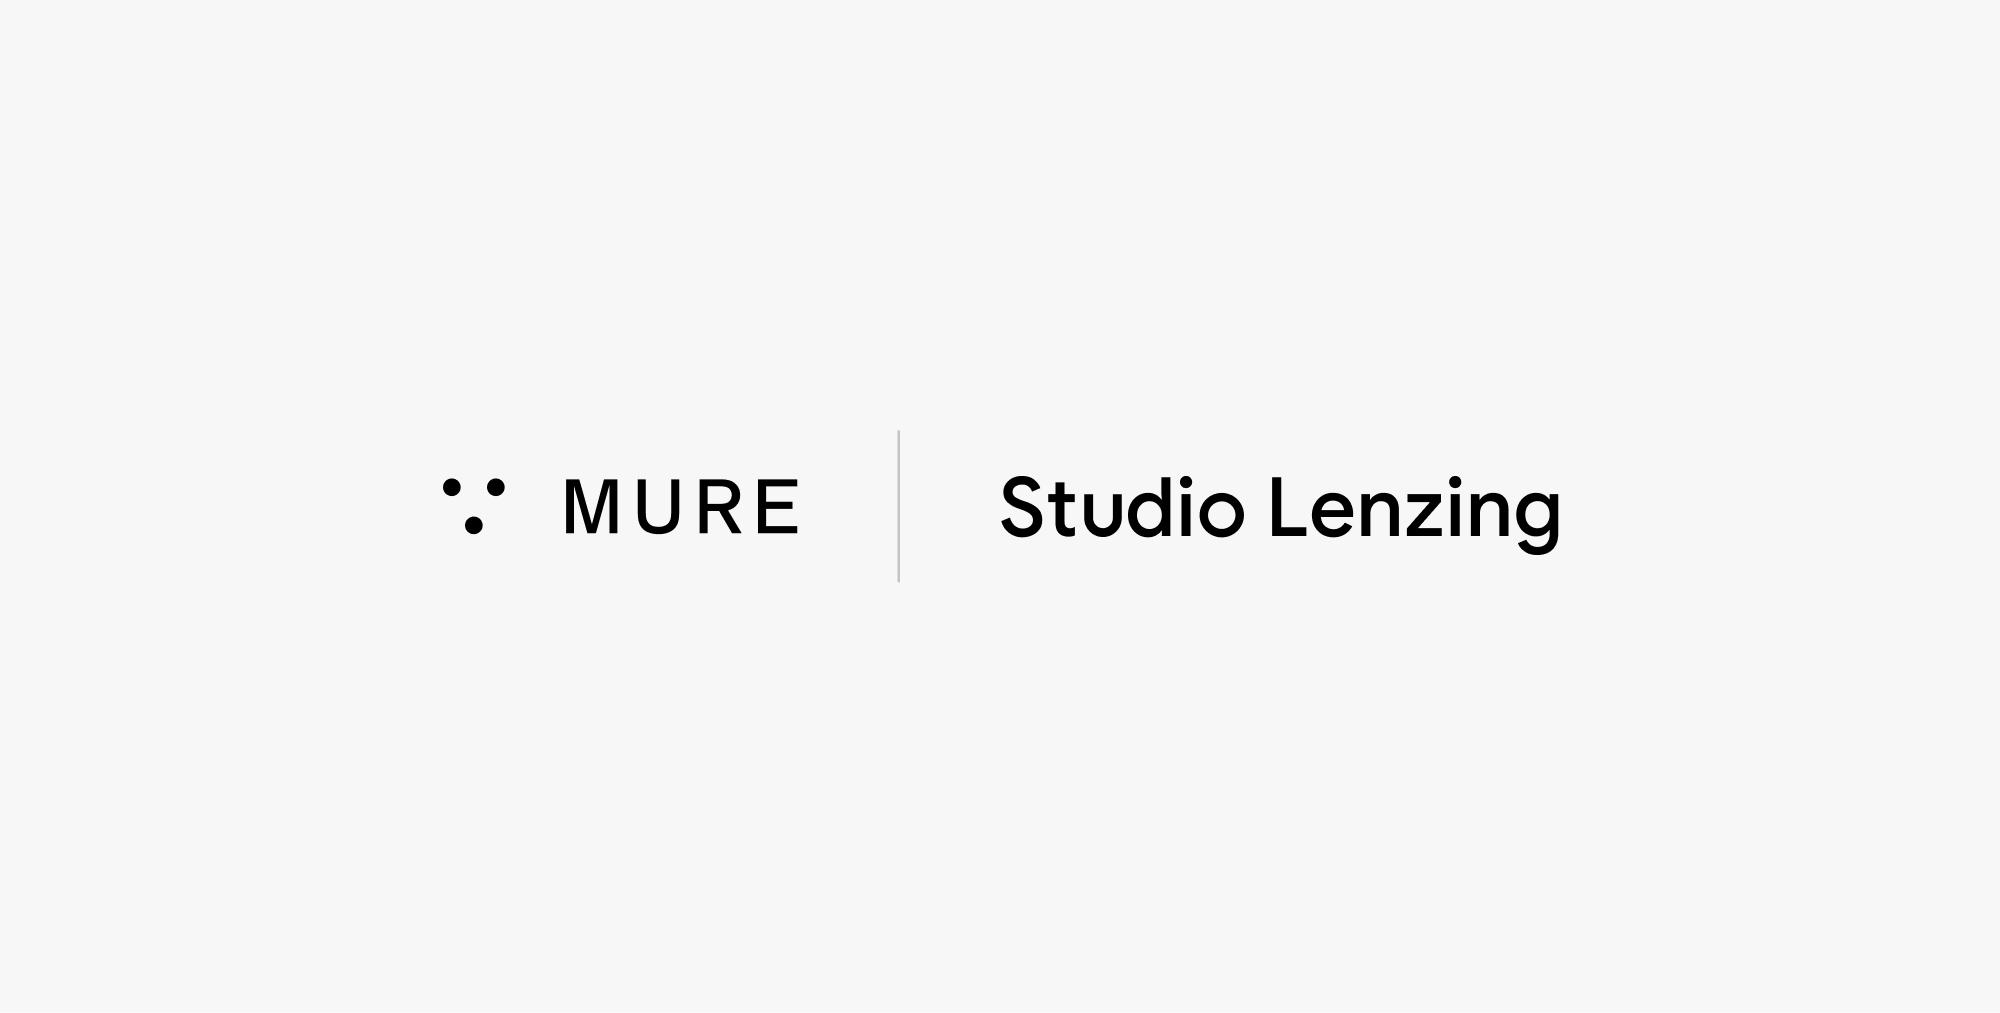 Mure Collaboration